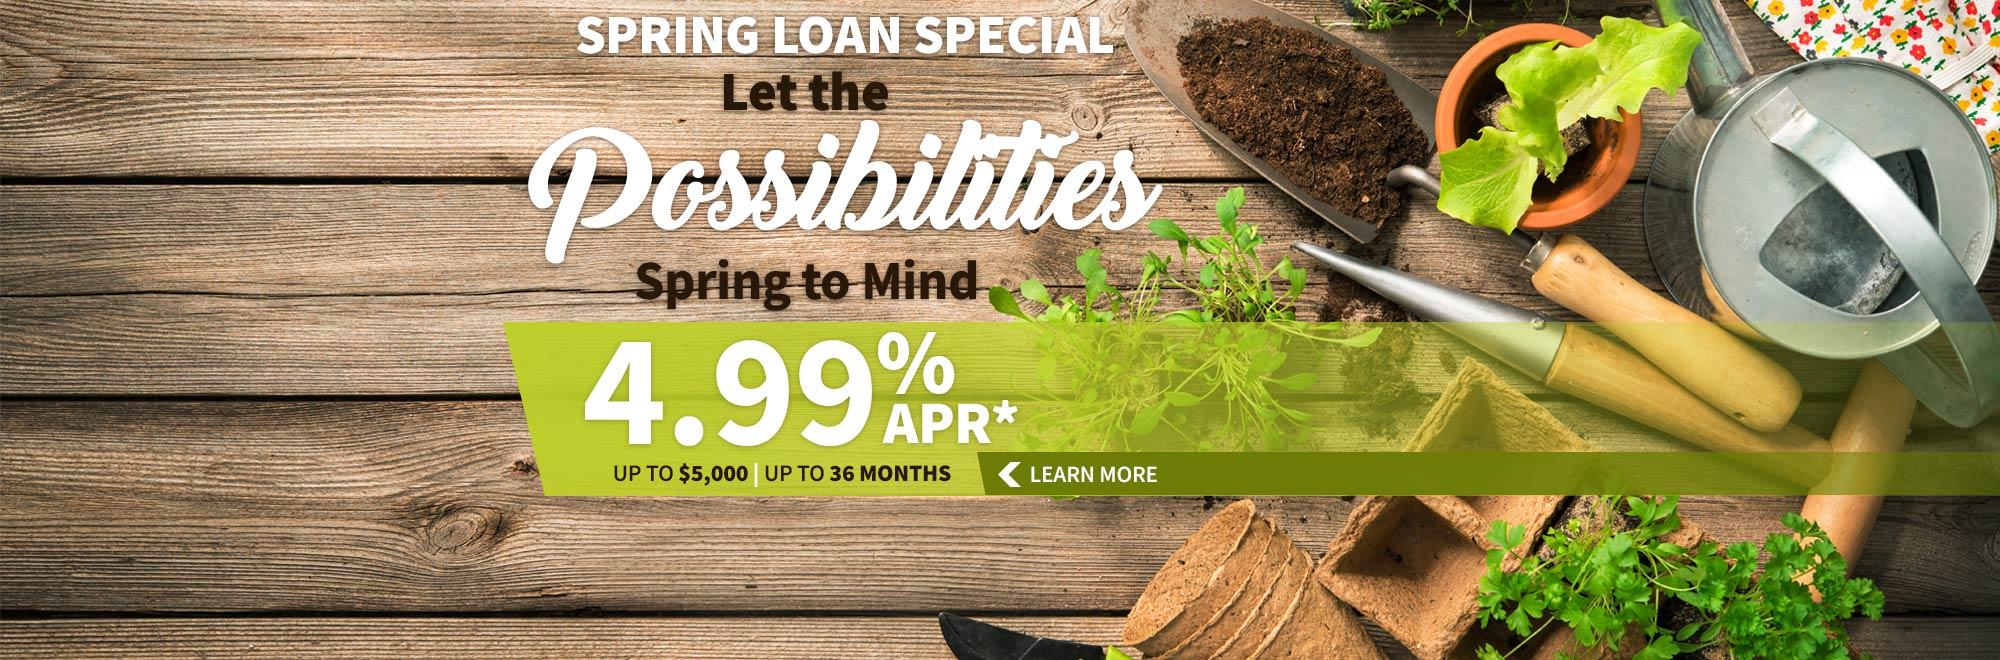 Spring Loan Special